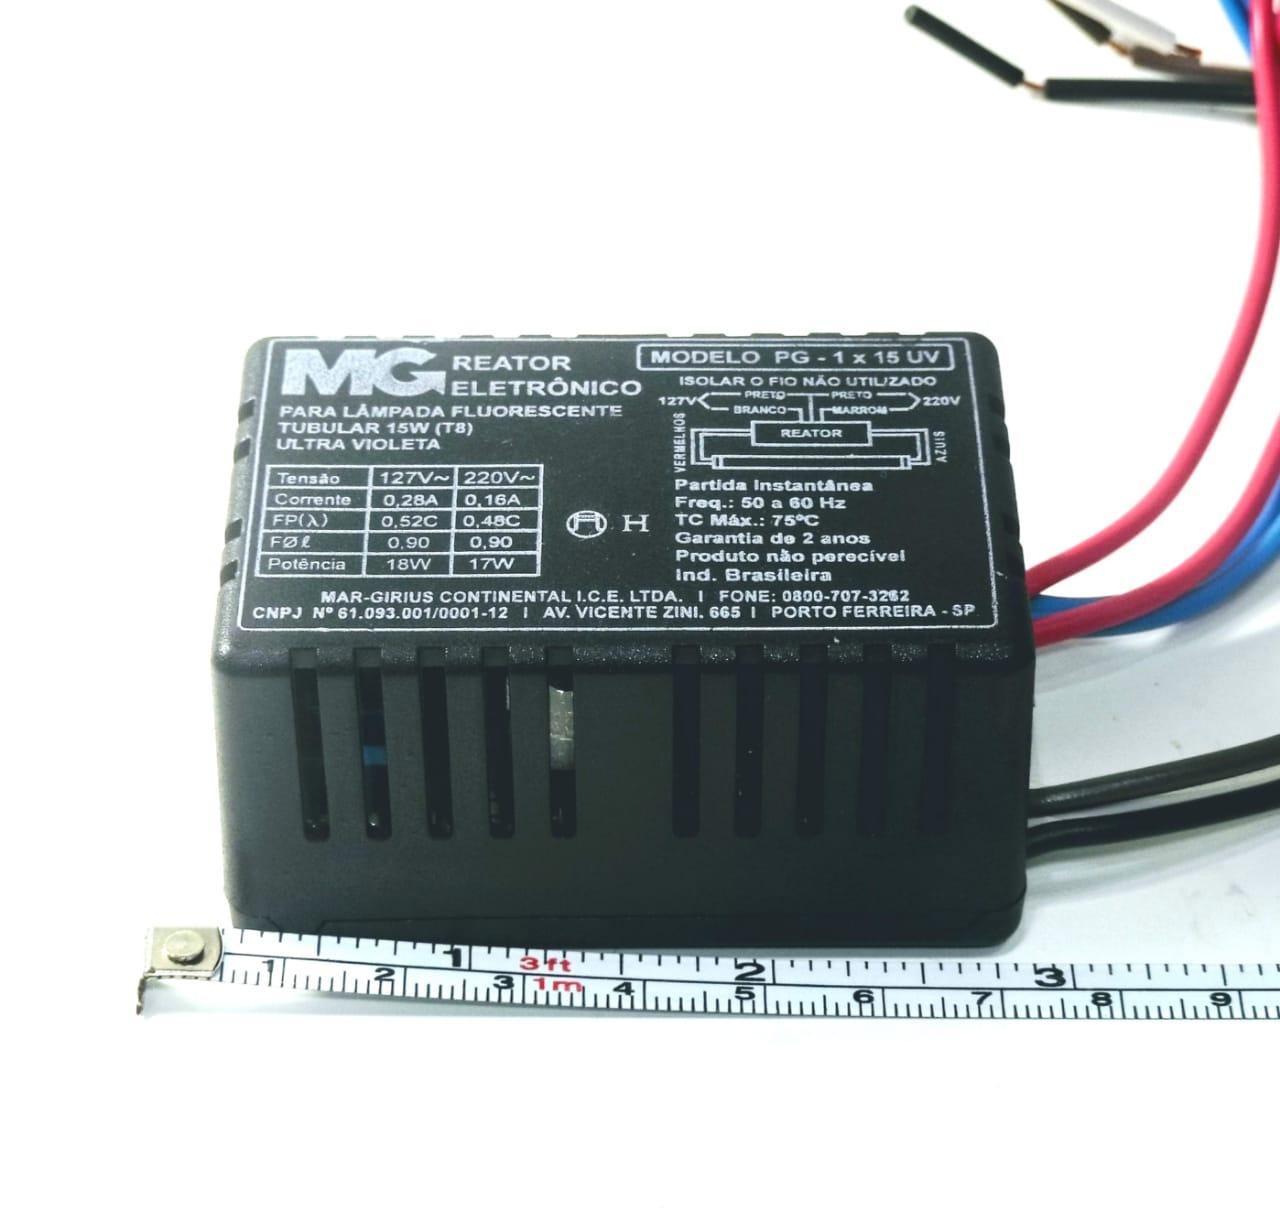 Reator P/ Lampada UVC 15W, Reator P/ Lâmpada UV 15W, Reator 1X15W